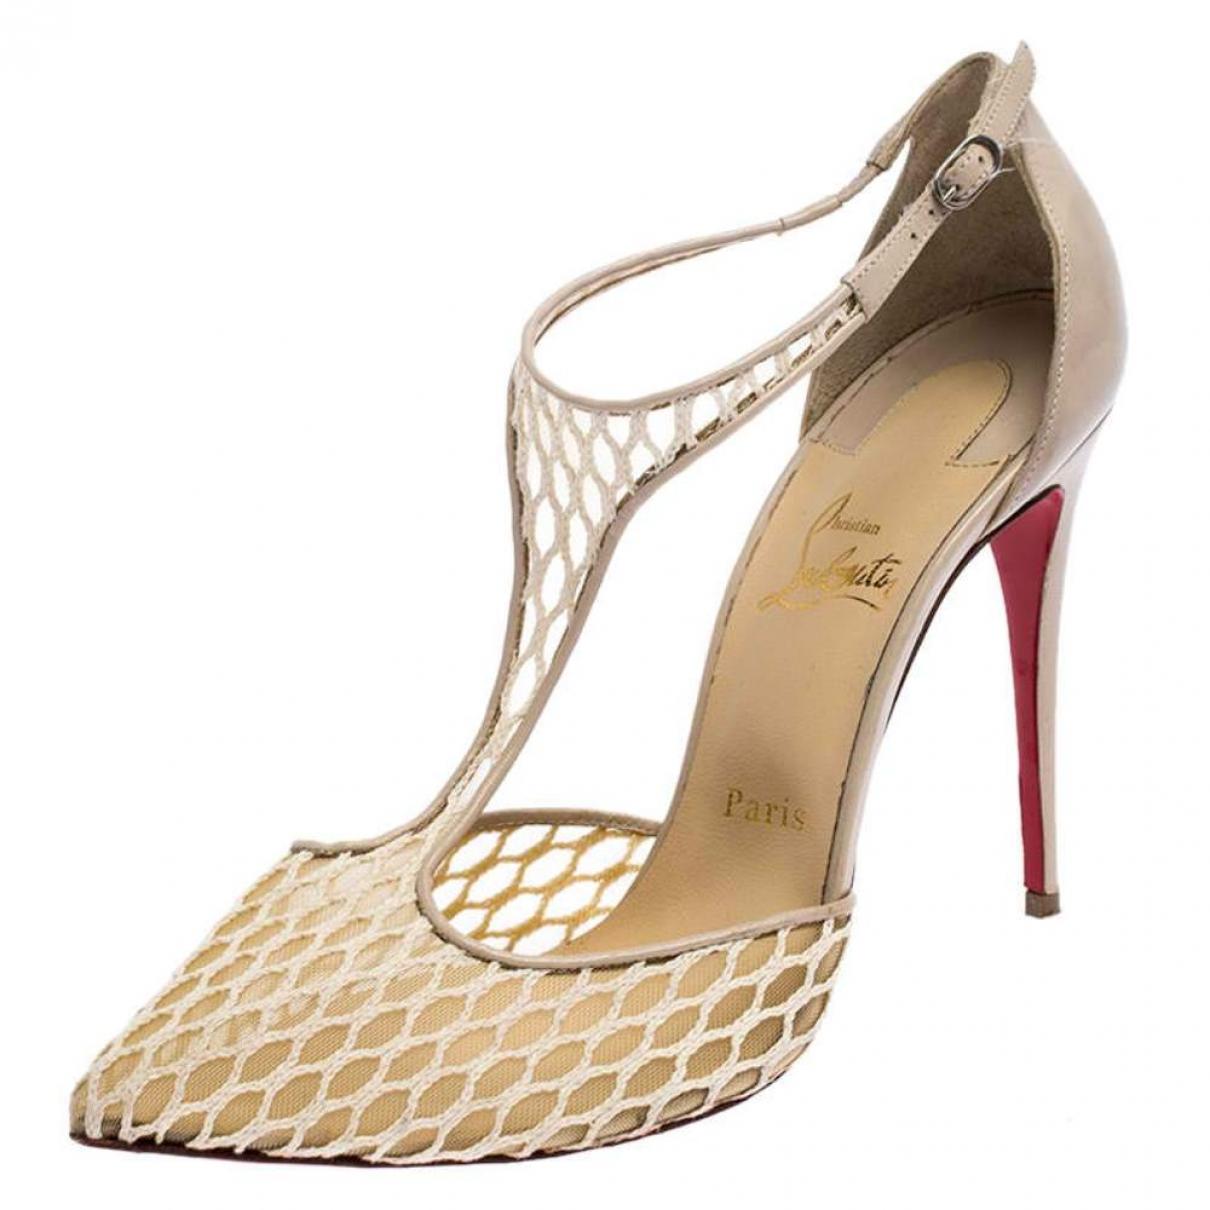 Christian Louboutin \N Beige Leather Heels for Women 9.5 US